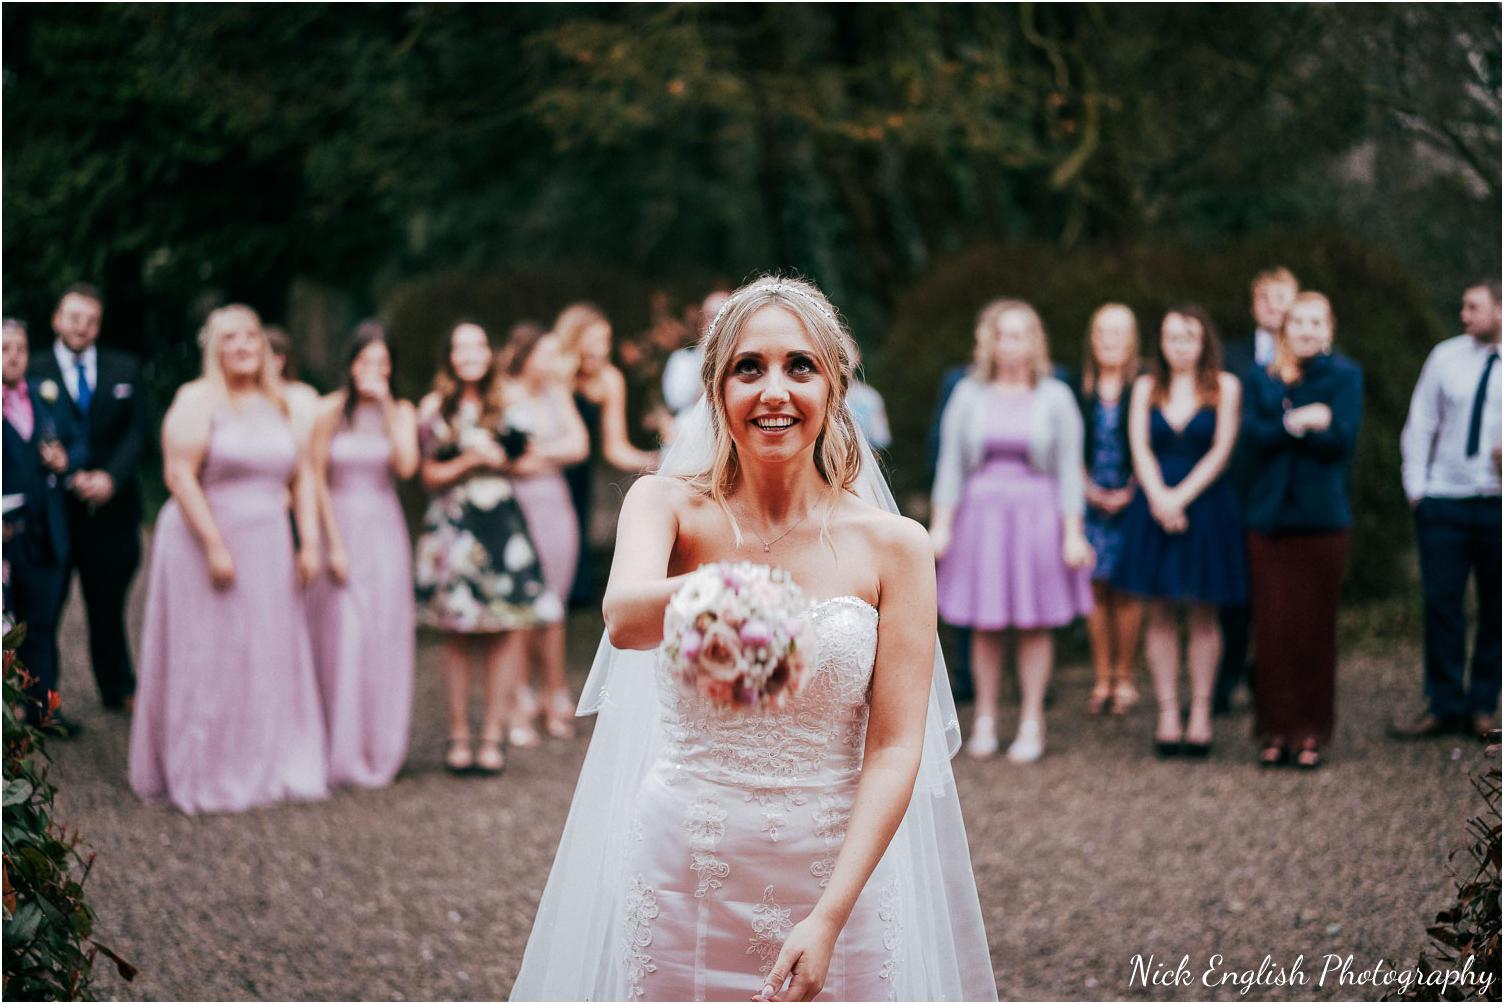 Mitton_Hall_Wedding_Photographer_2018-146.jpg